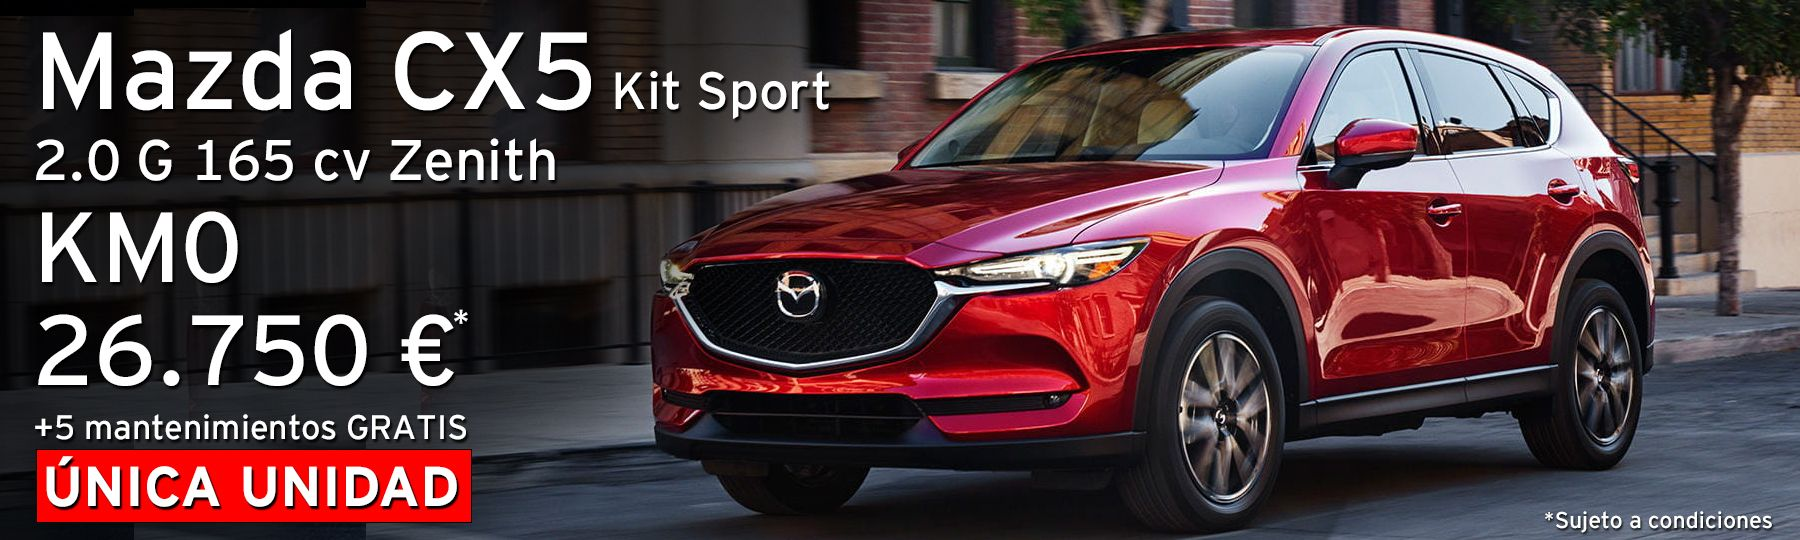 Mazda CX5 2.0G SkyActiv 165 cv Km.0 Zenith